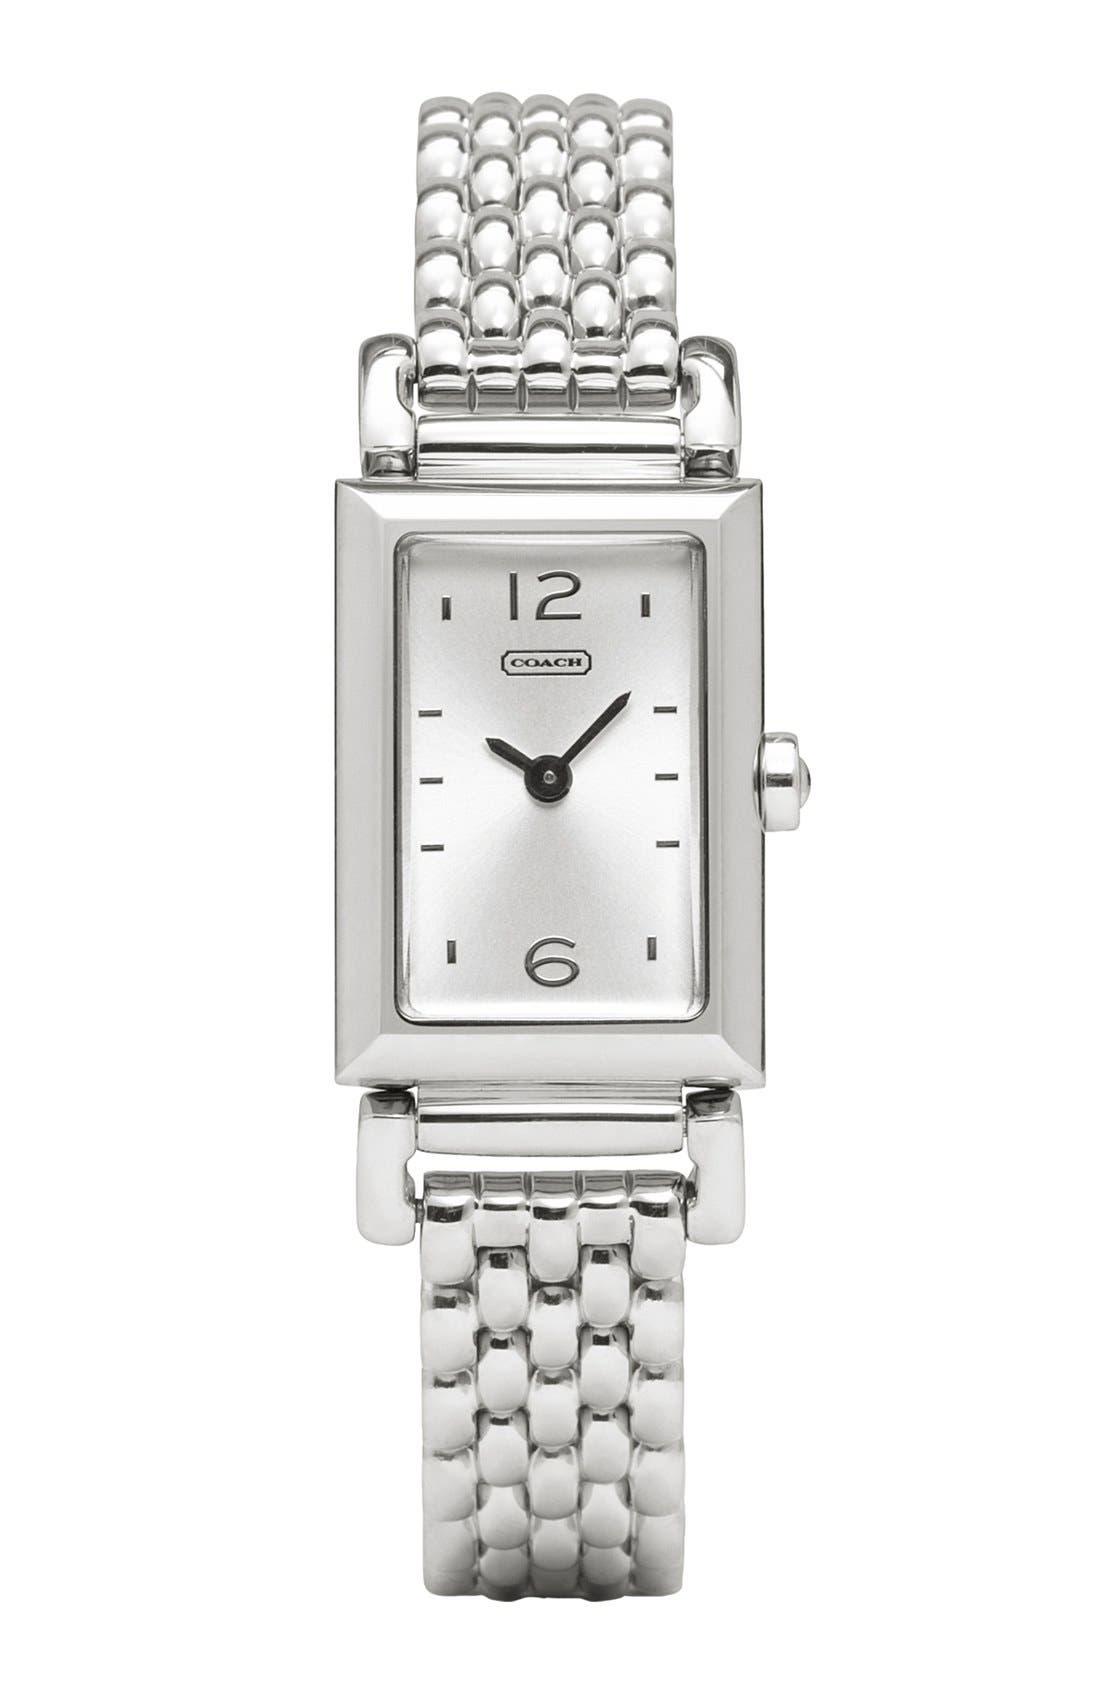 Main Image - COACH 'Small Madison' Bracelet Watch, 11mm x 17mm